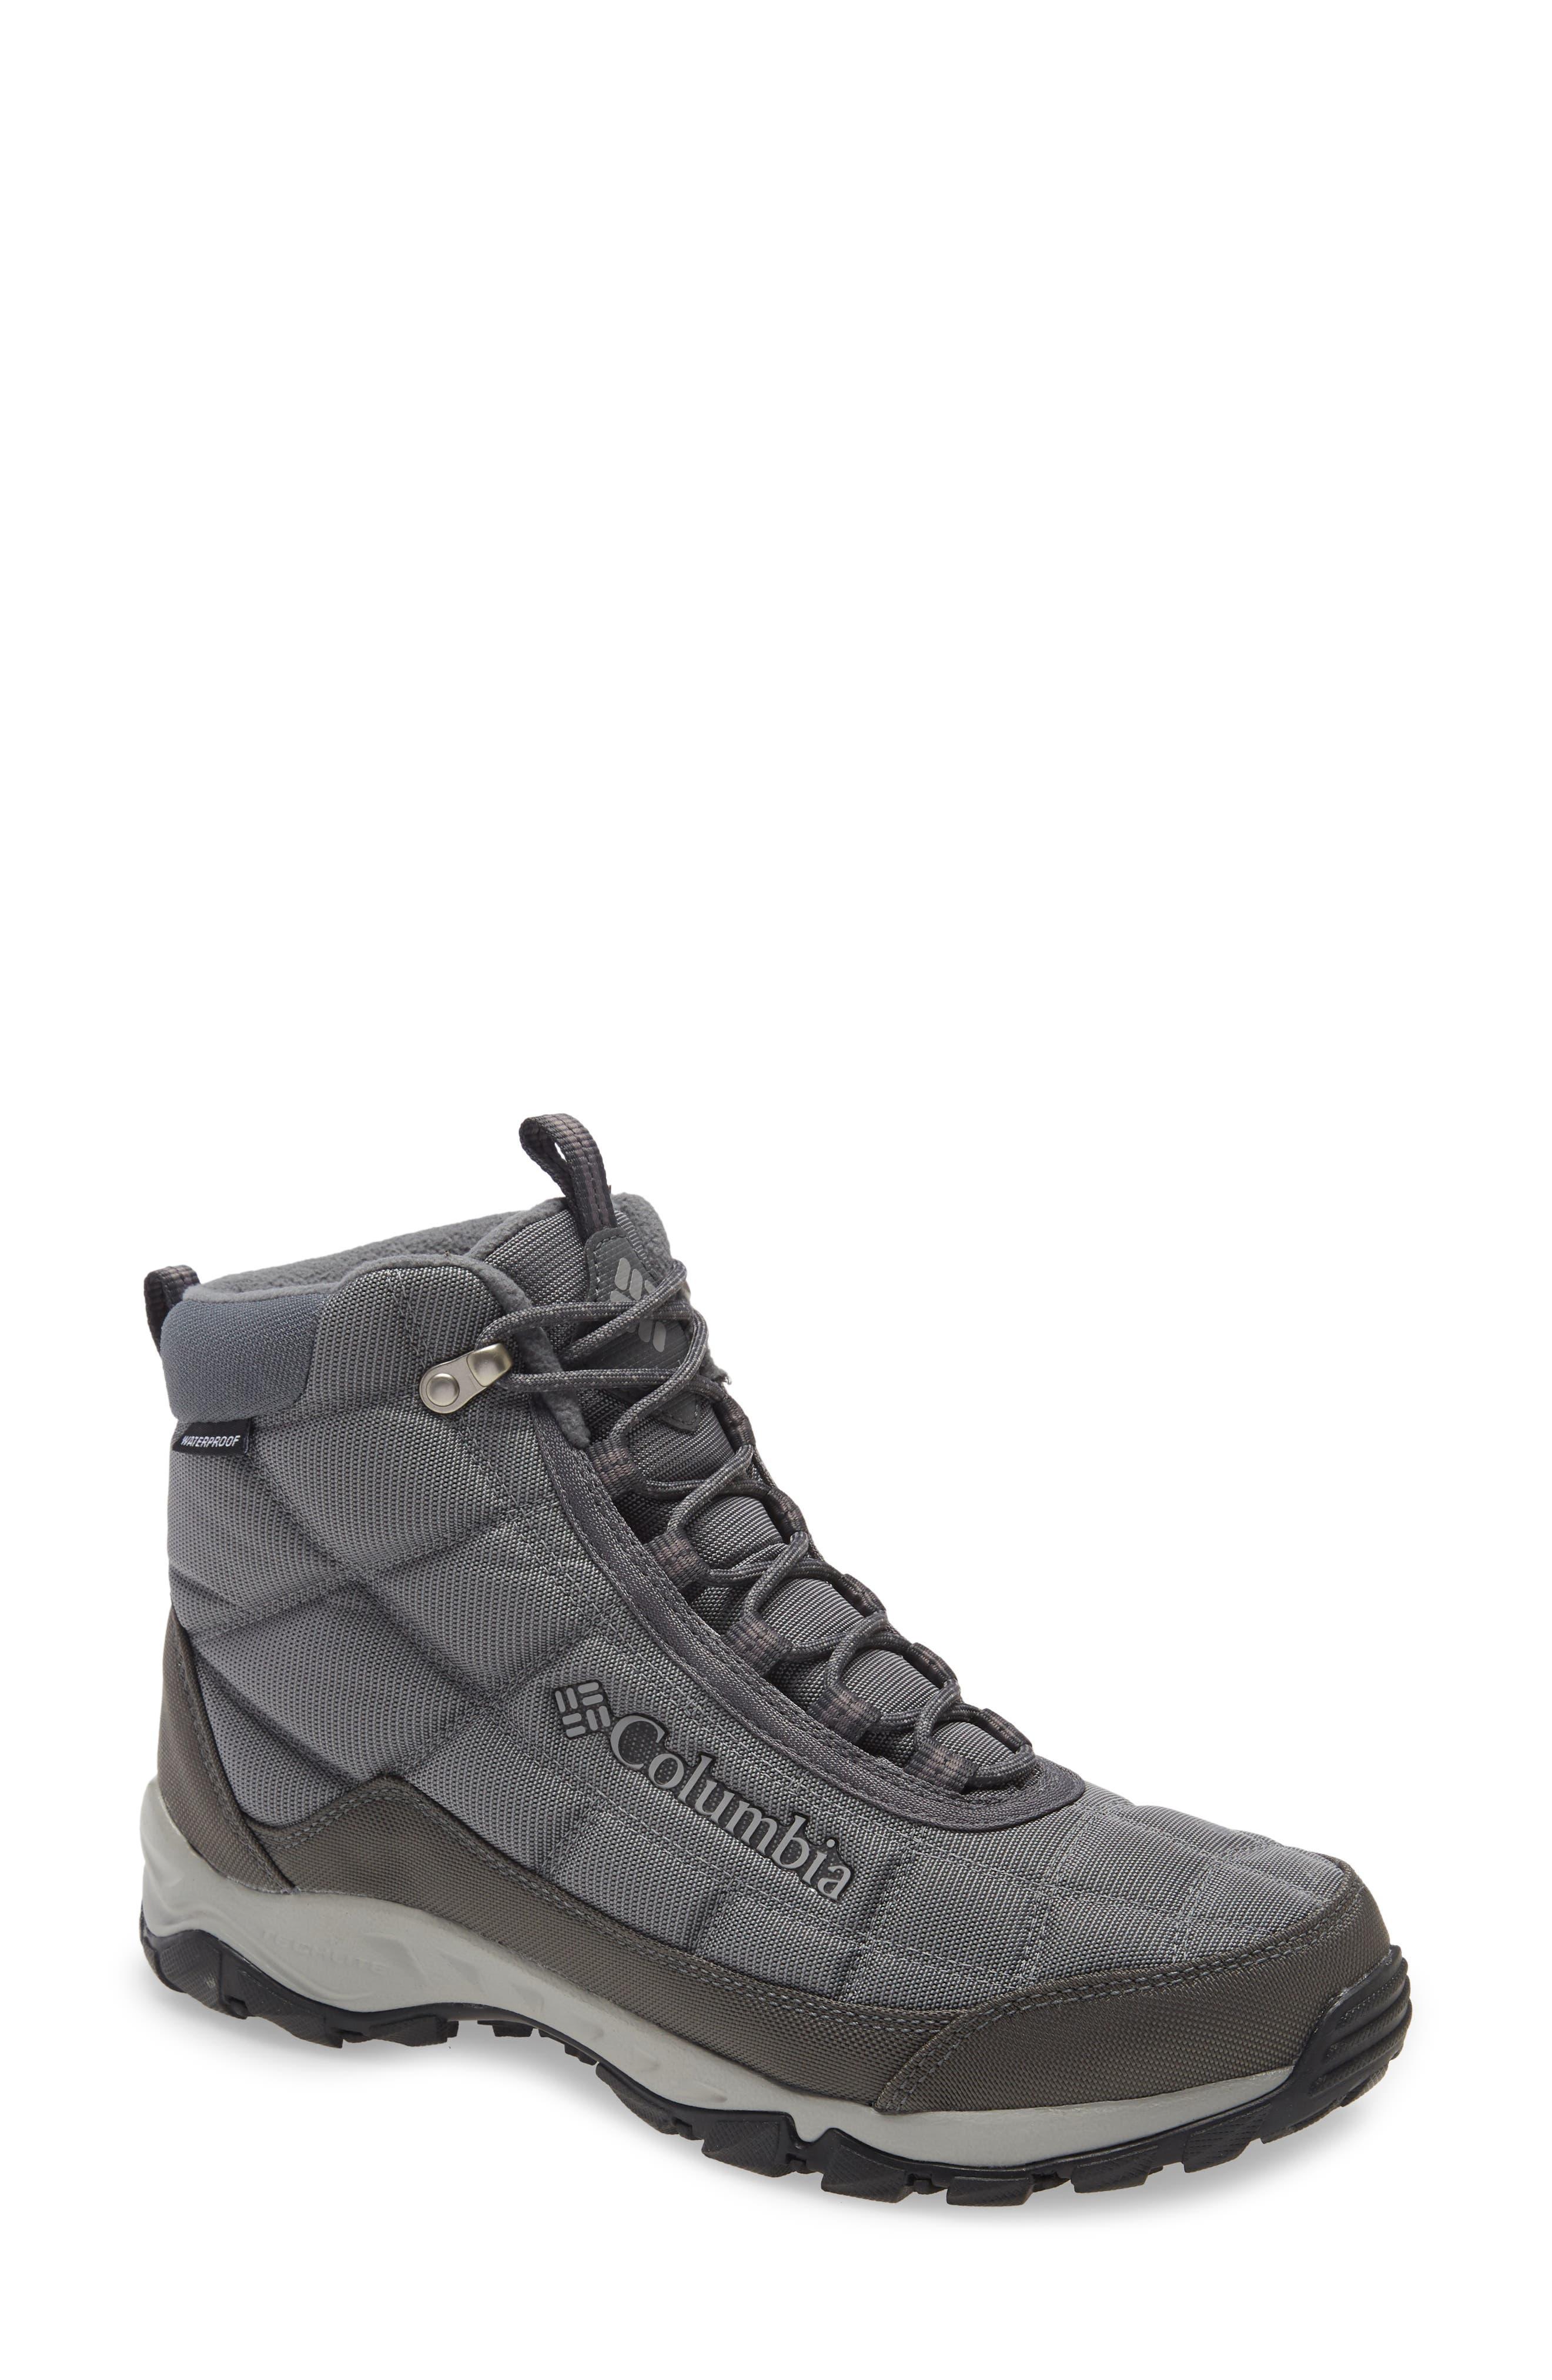 Firecamp(TM) Boot